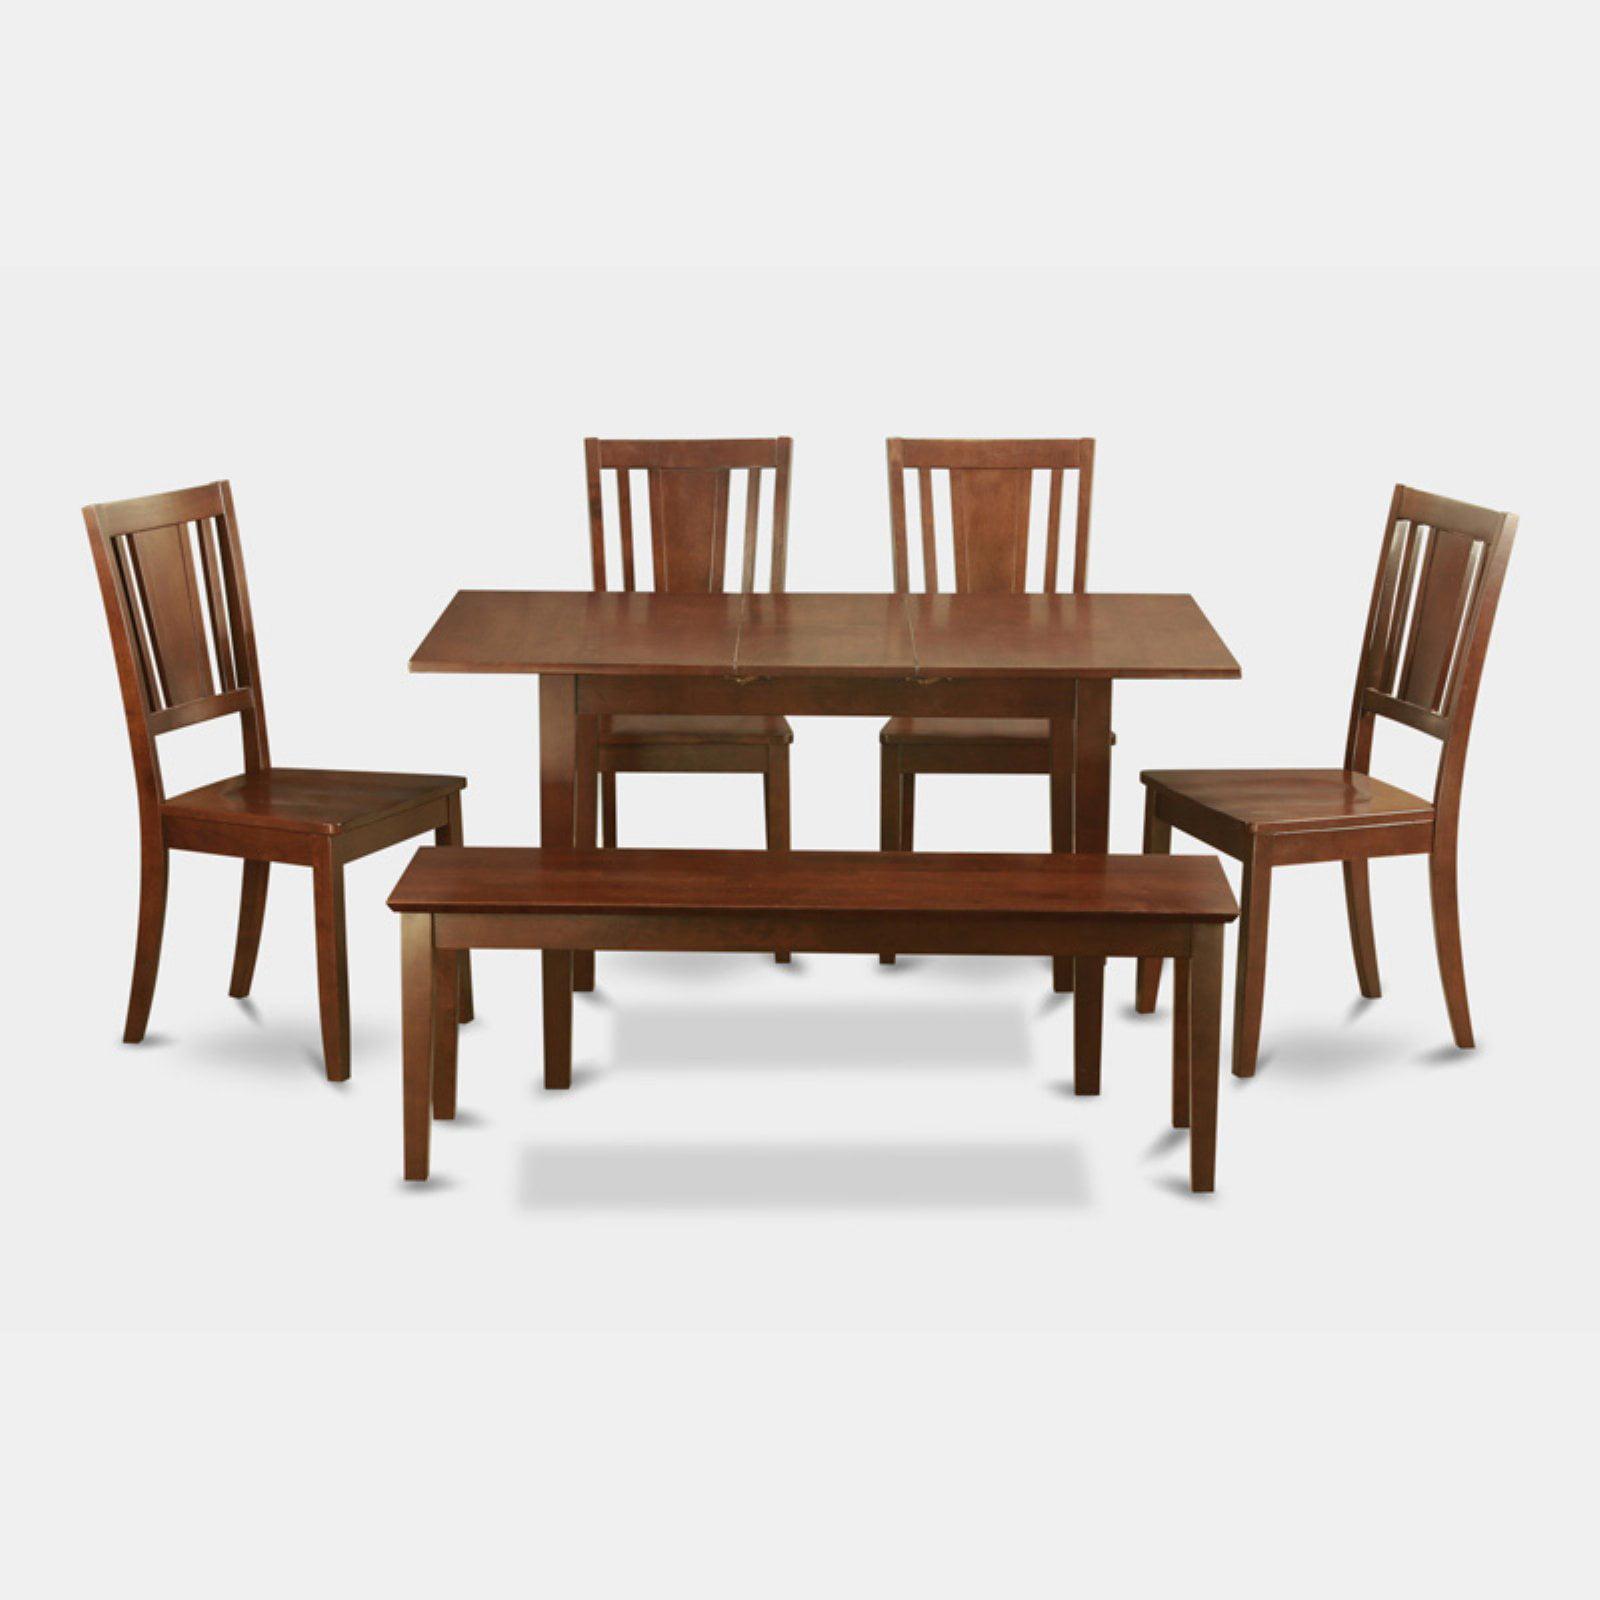 East West Furniture Norfolk 6 Piece Scotch Art Dining Table Set